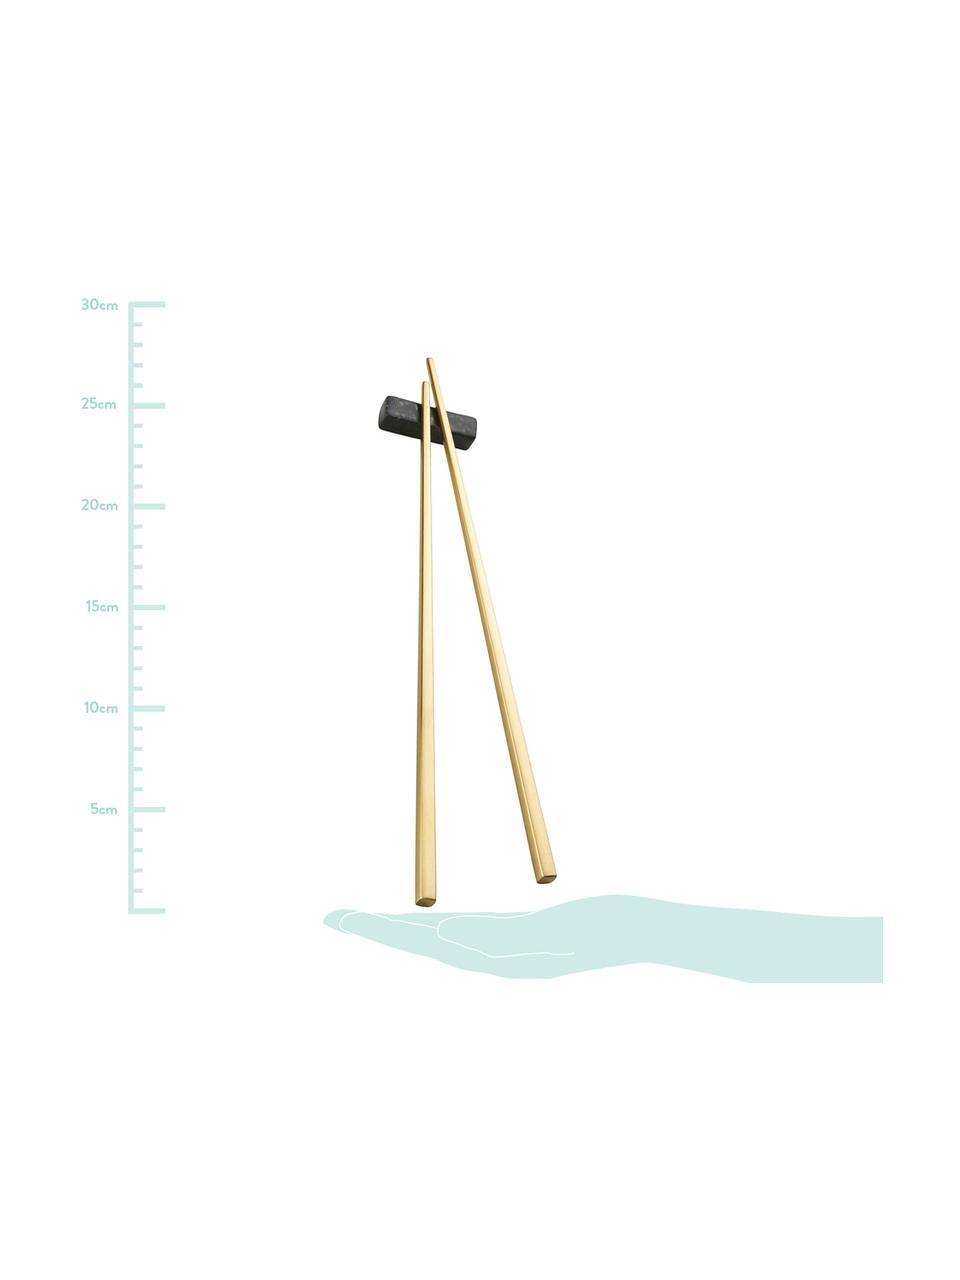 Set de palillos chinos Chop, 2pares, Dorado, negro, L 26 cm